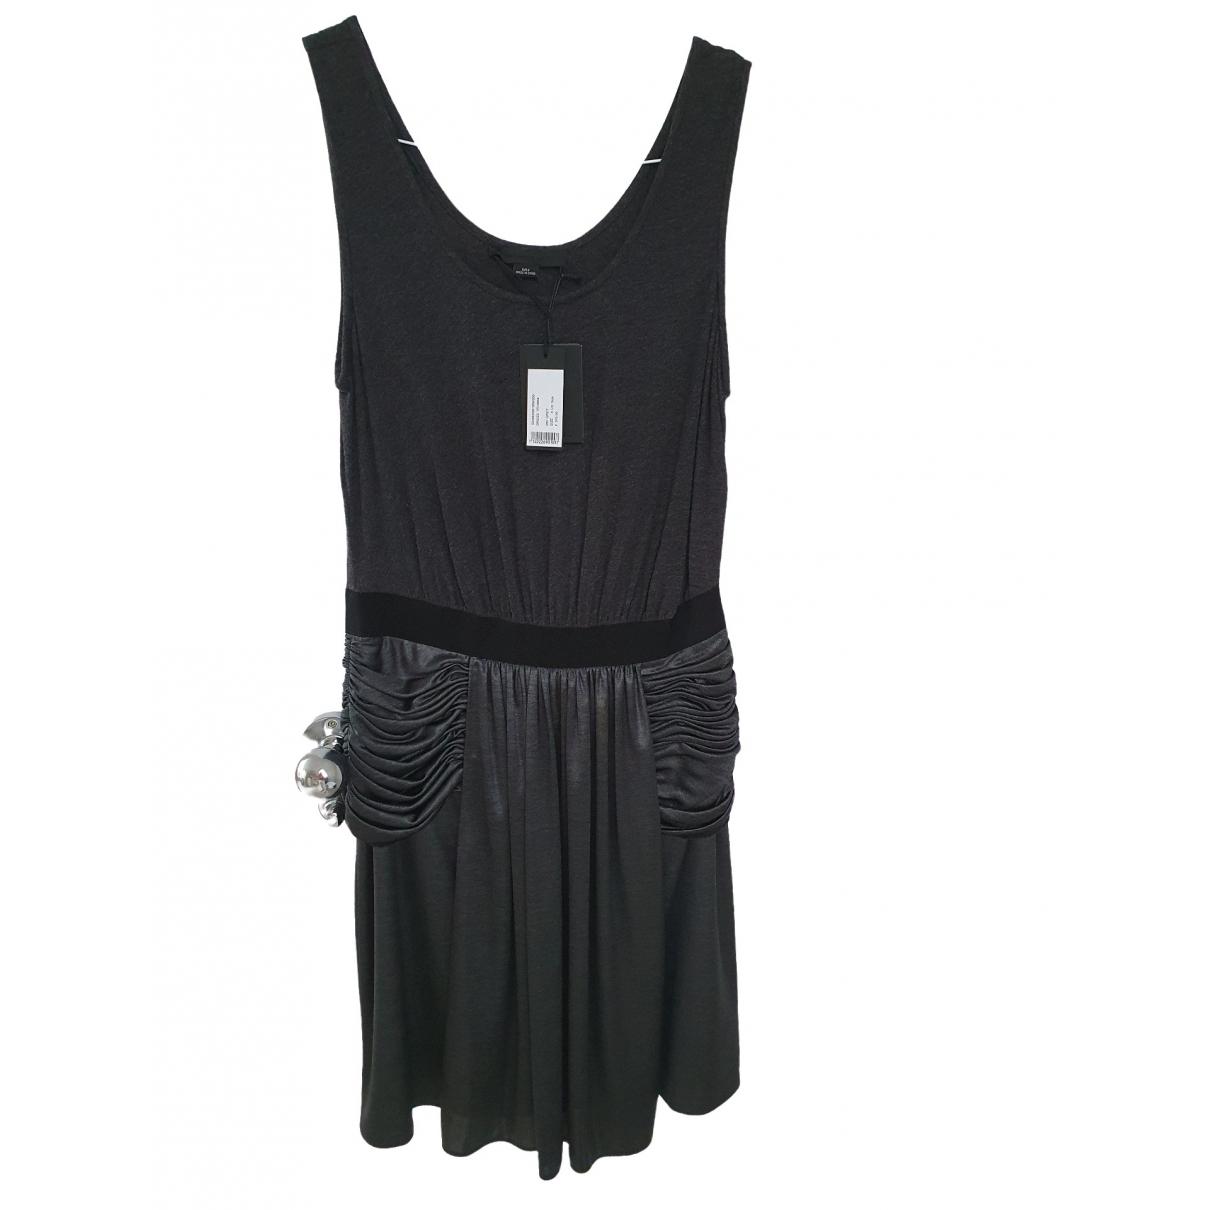 Alexander Wang \N Anthracite Cotton - elasthane dress for Women 8 US